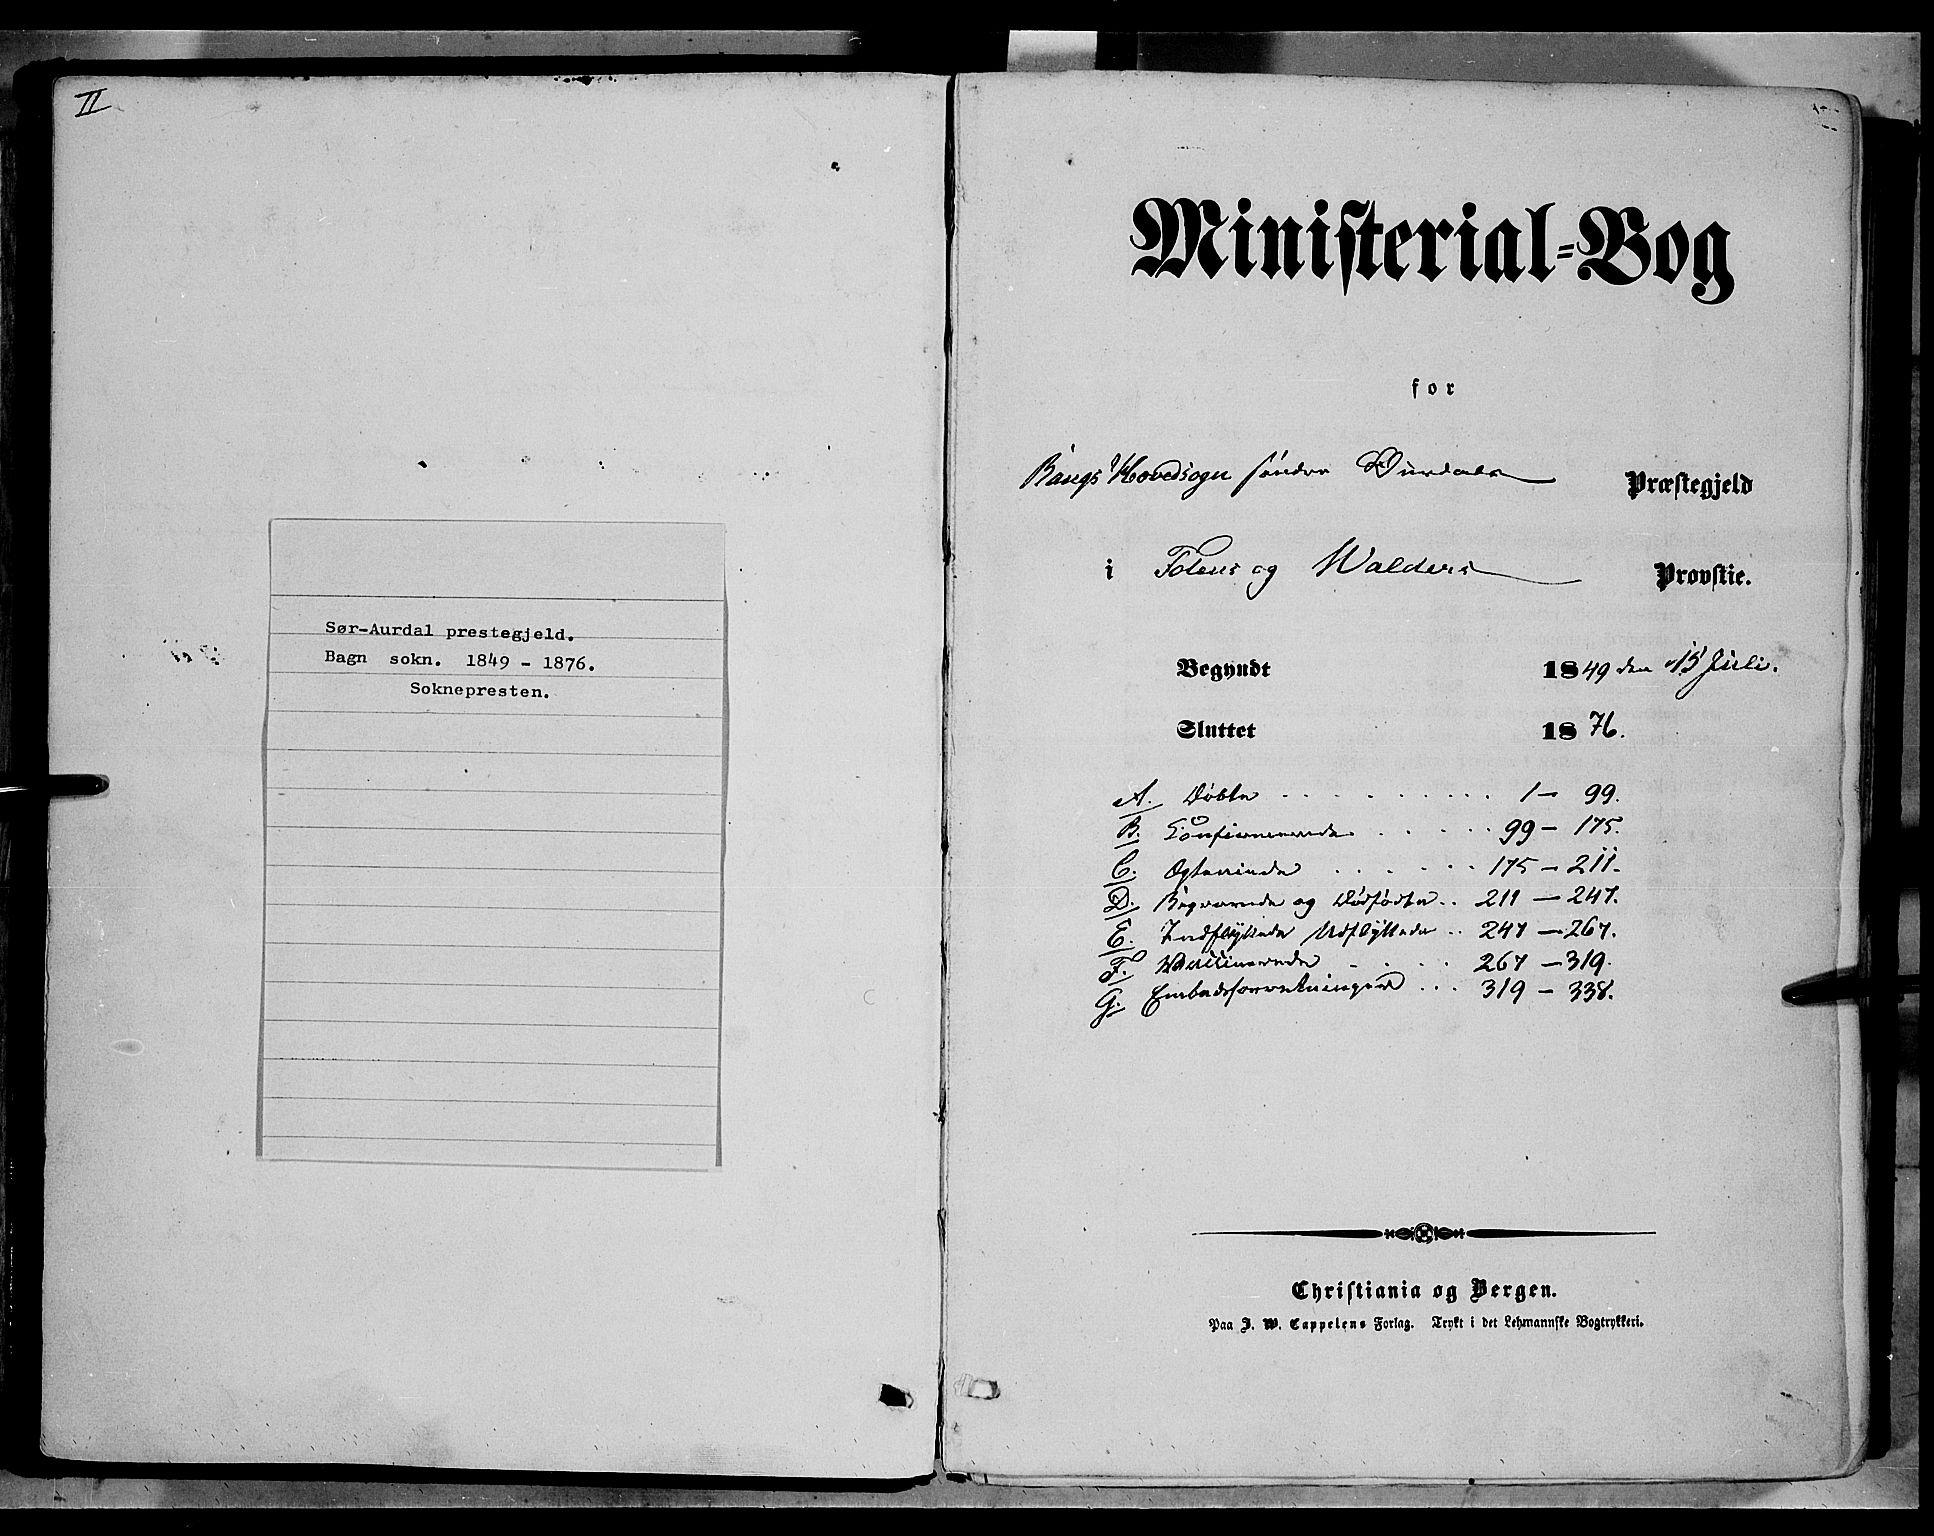 SAH, Sør-Aurdal prestekontor, Ministerialbok nr. 5, 1849-1876